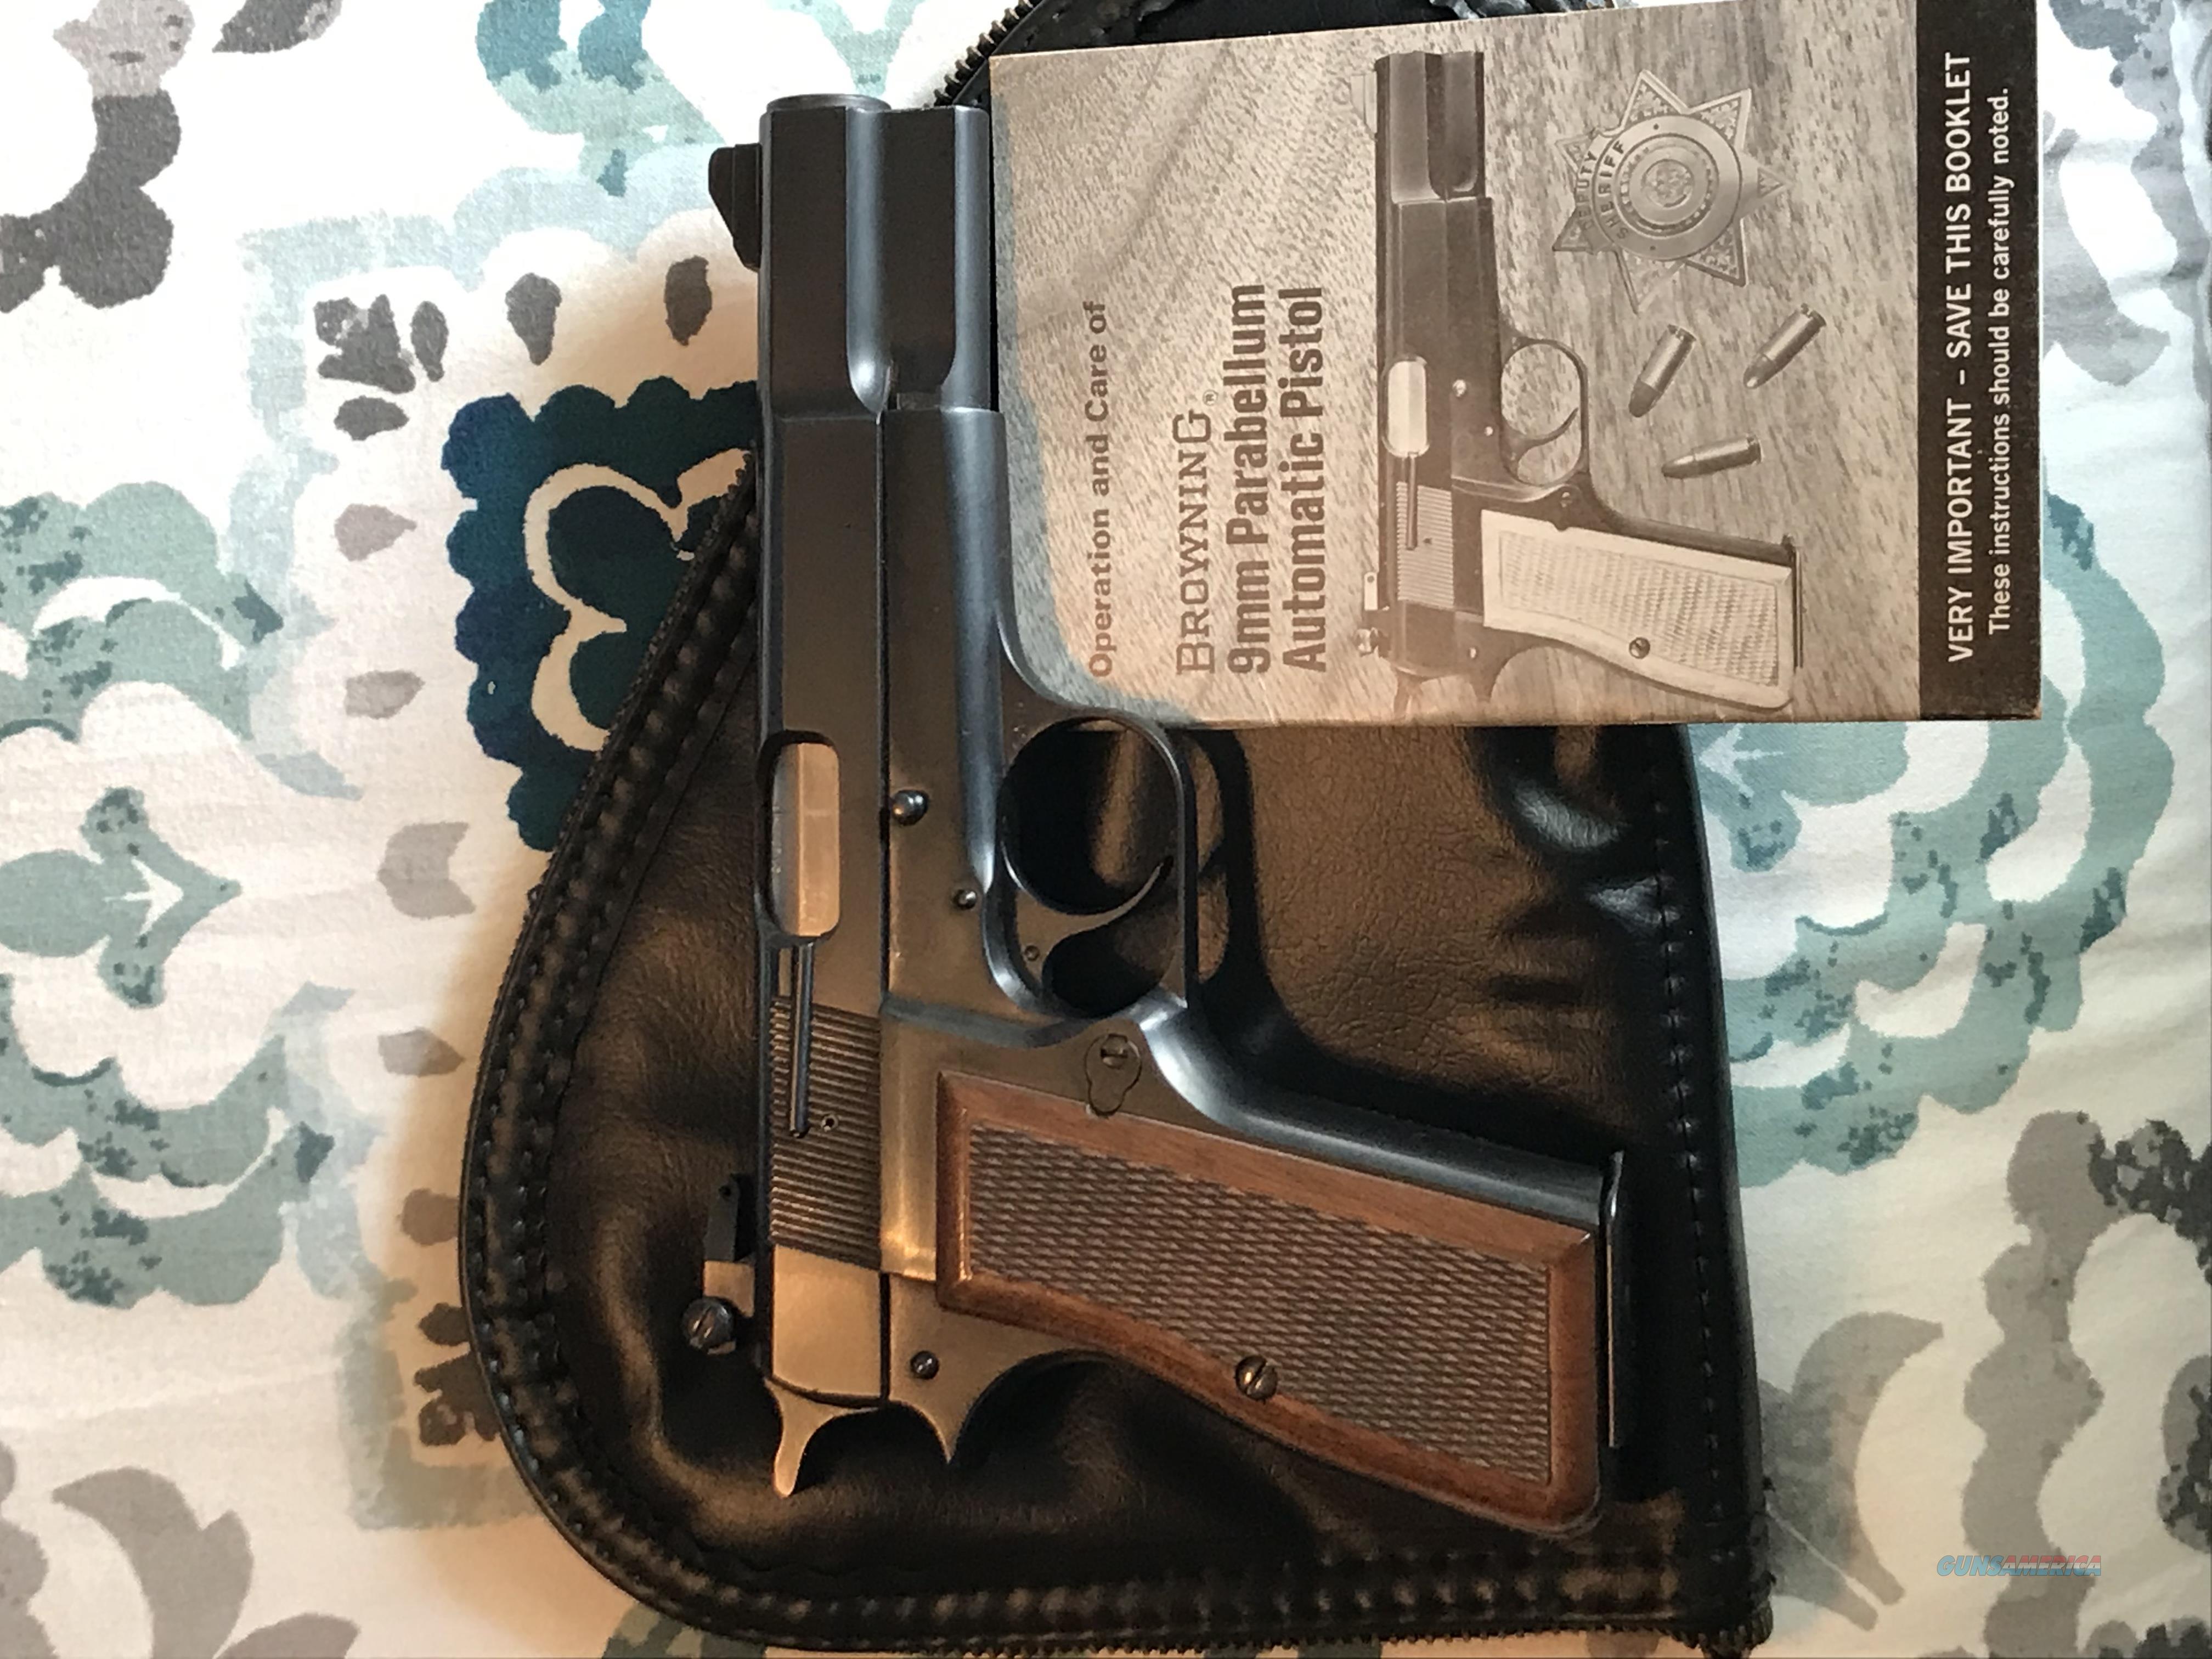 1976 Browning Belgium Hi-Power   Guns > Pistols > Browning Pistols > Hi Power